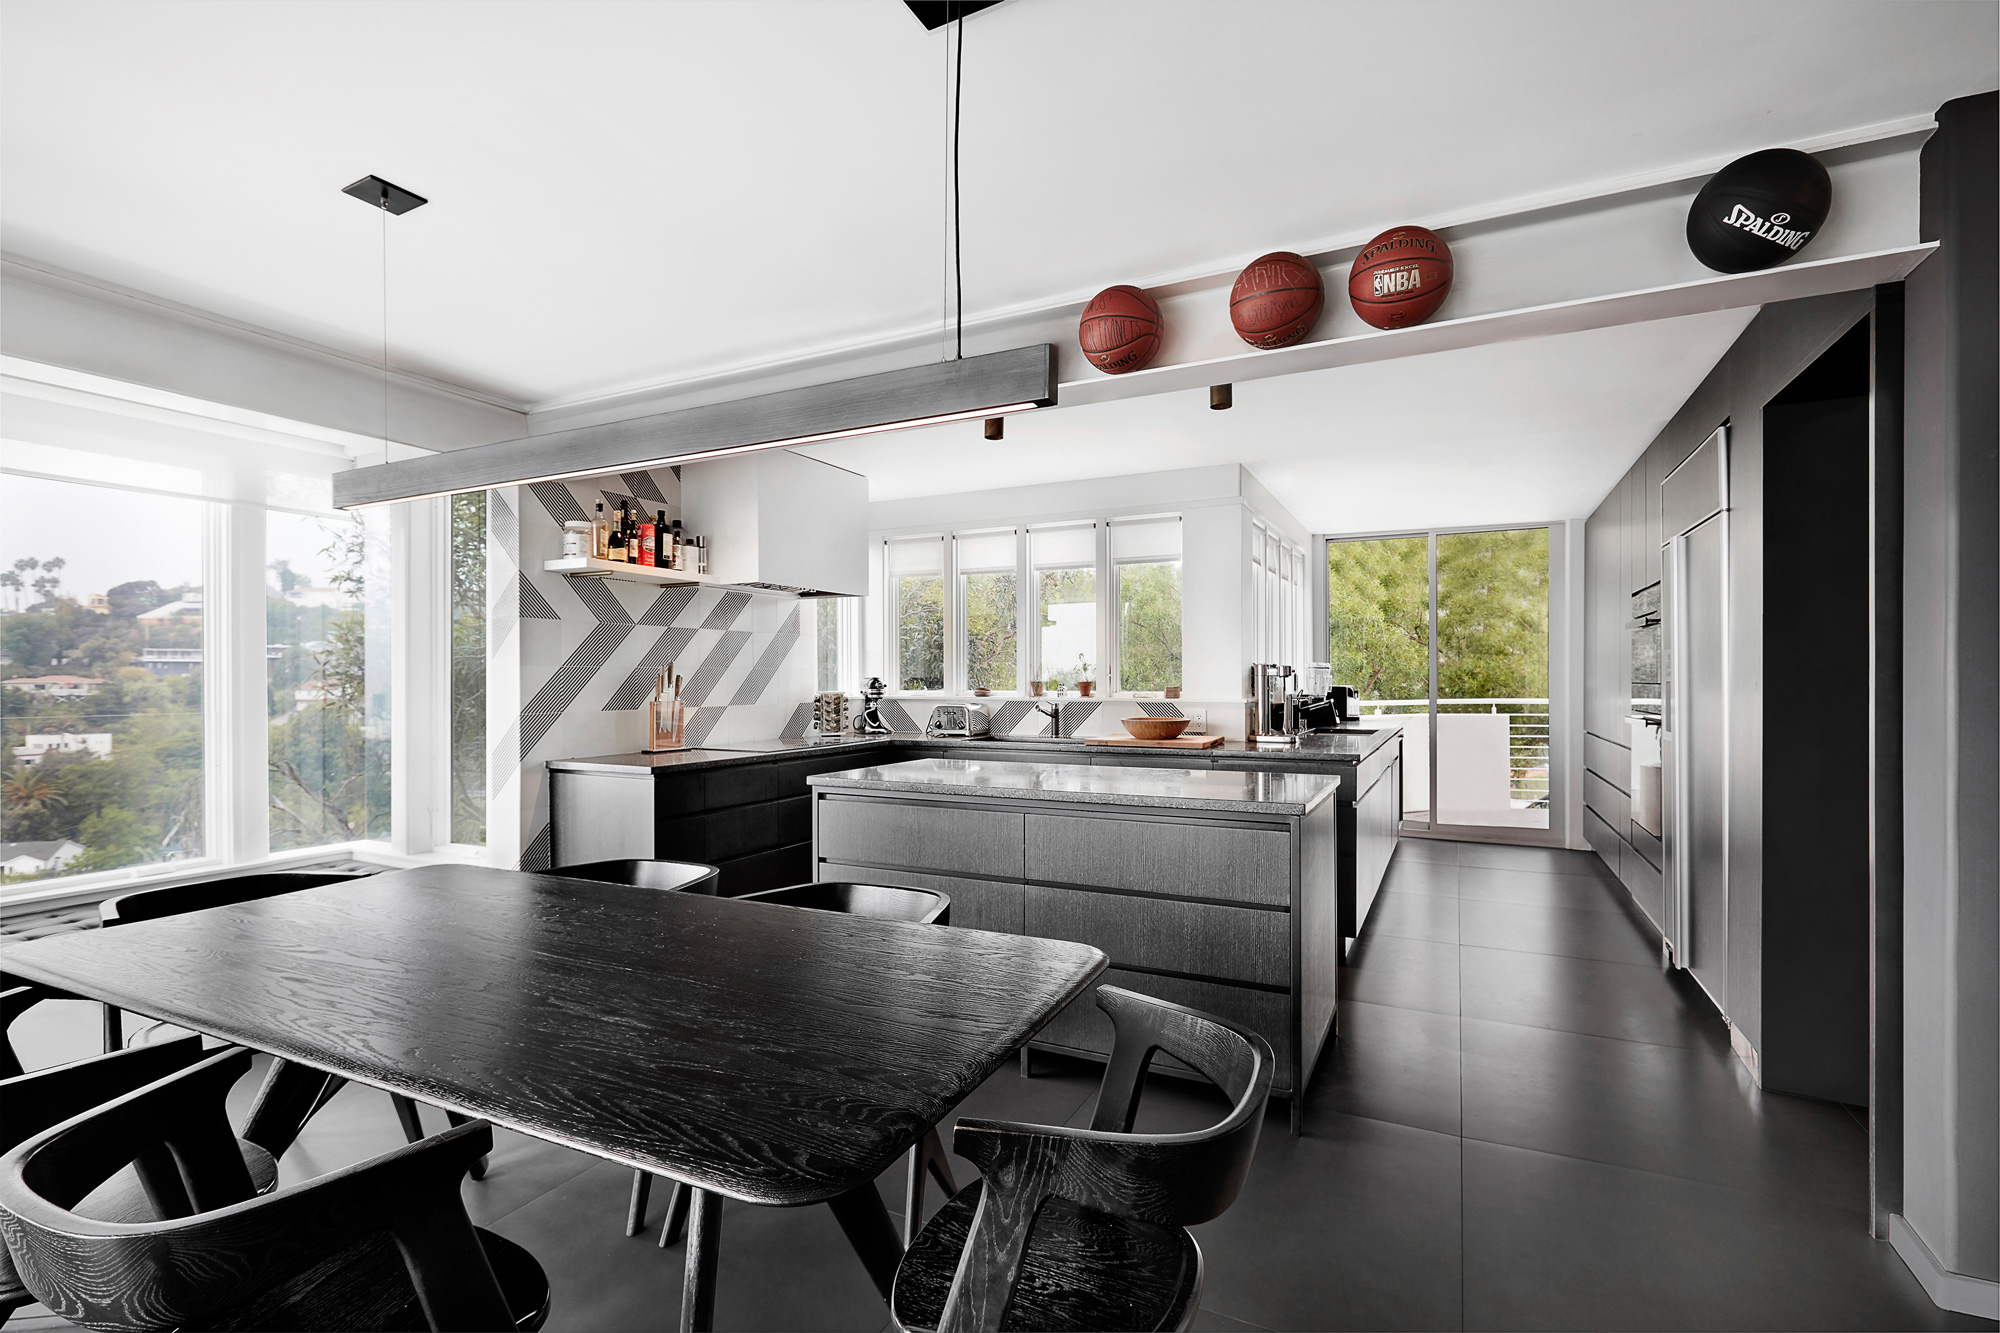 Beachwood_Kitchen-01.jpg